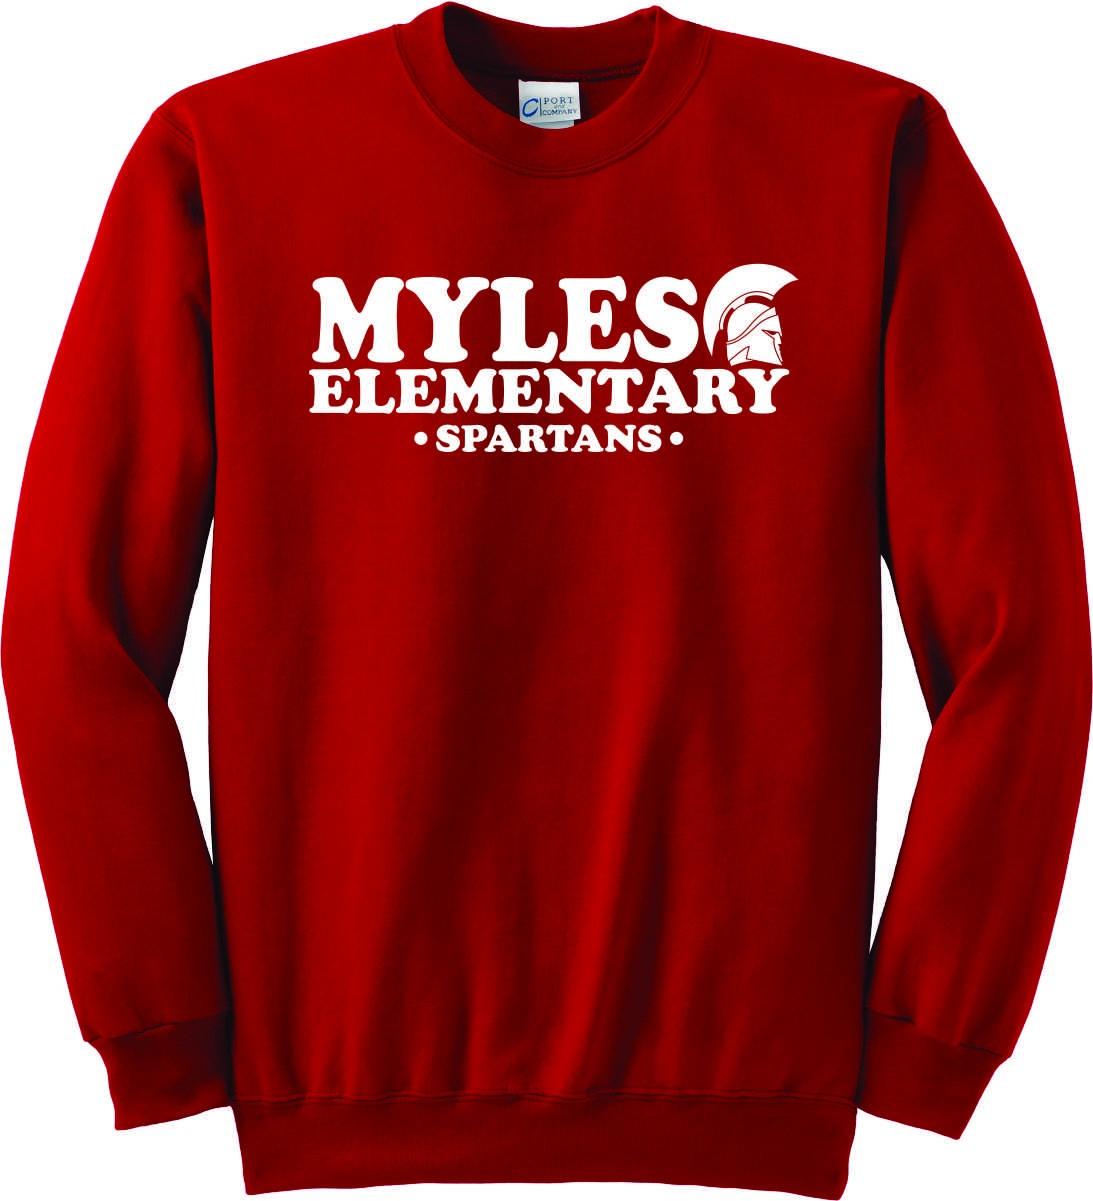 Myles Elementary Sweatshirt